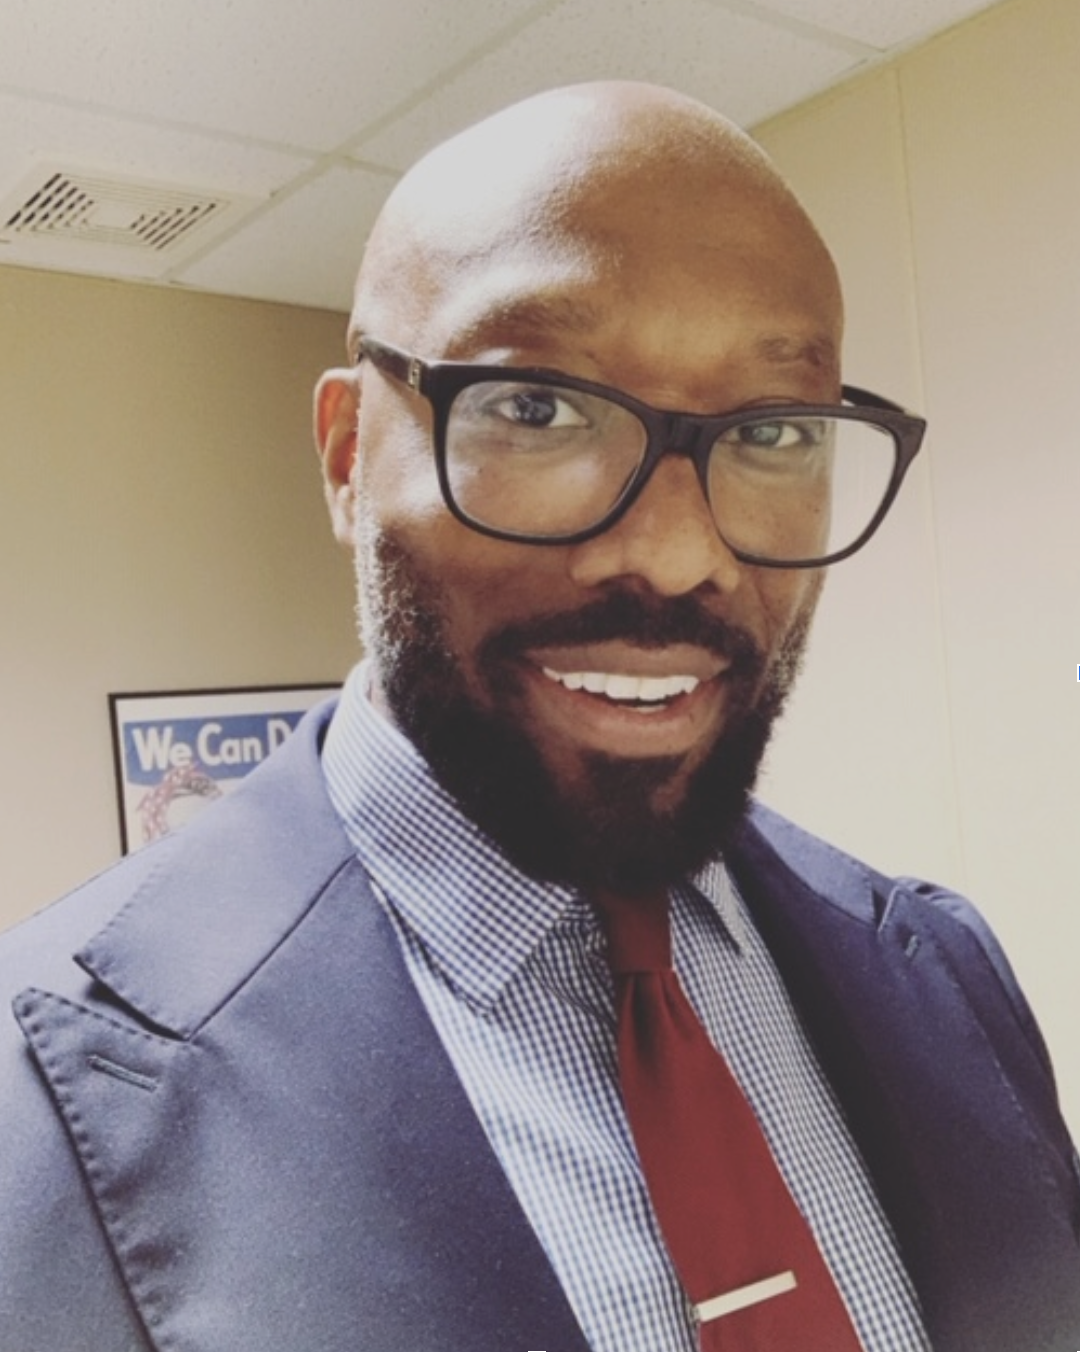 Meet the new principal: Mr. Antonio Hall